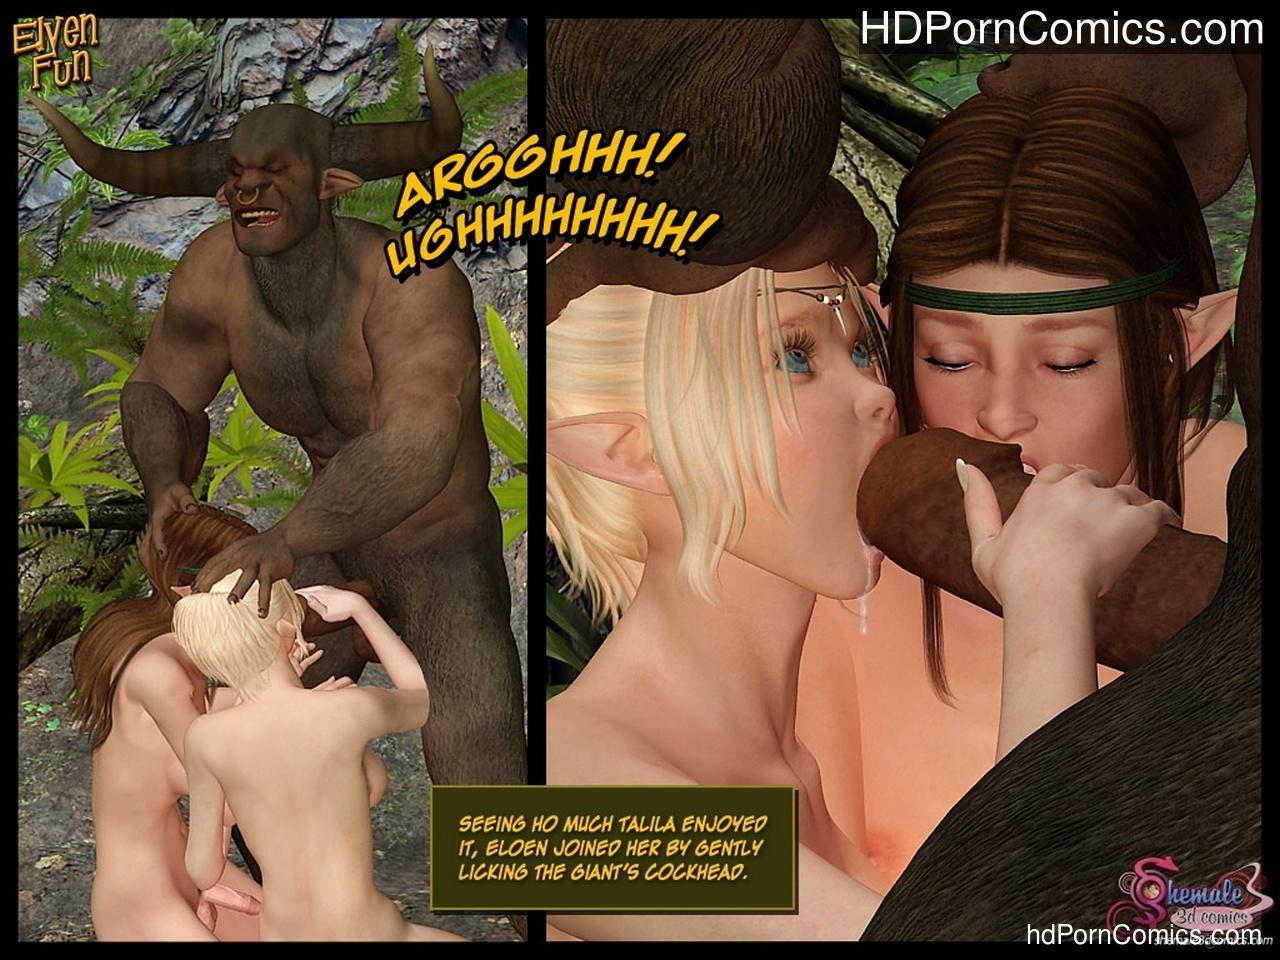 Elven-Fun51 free sex comic